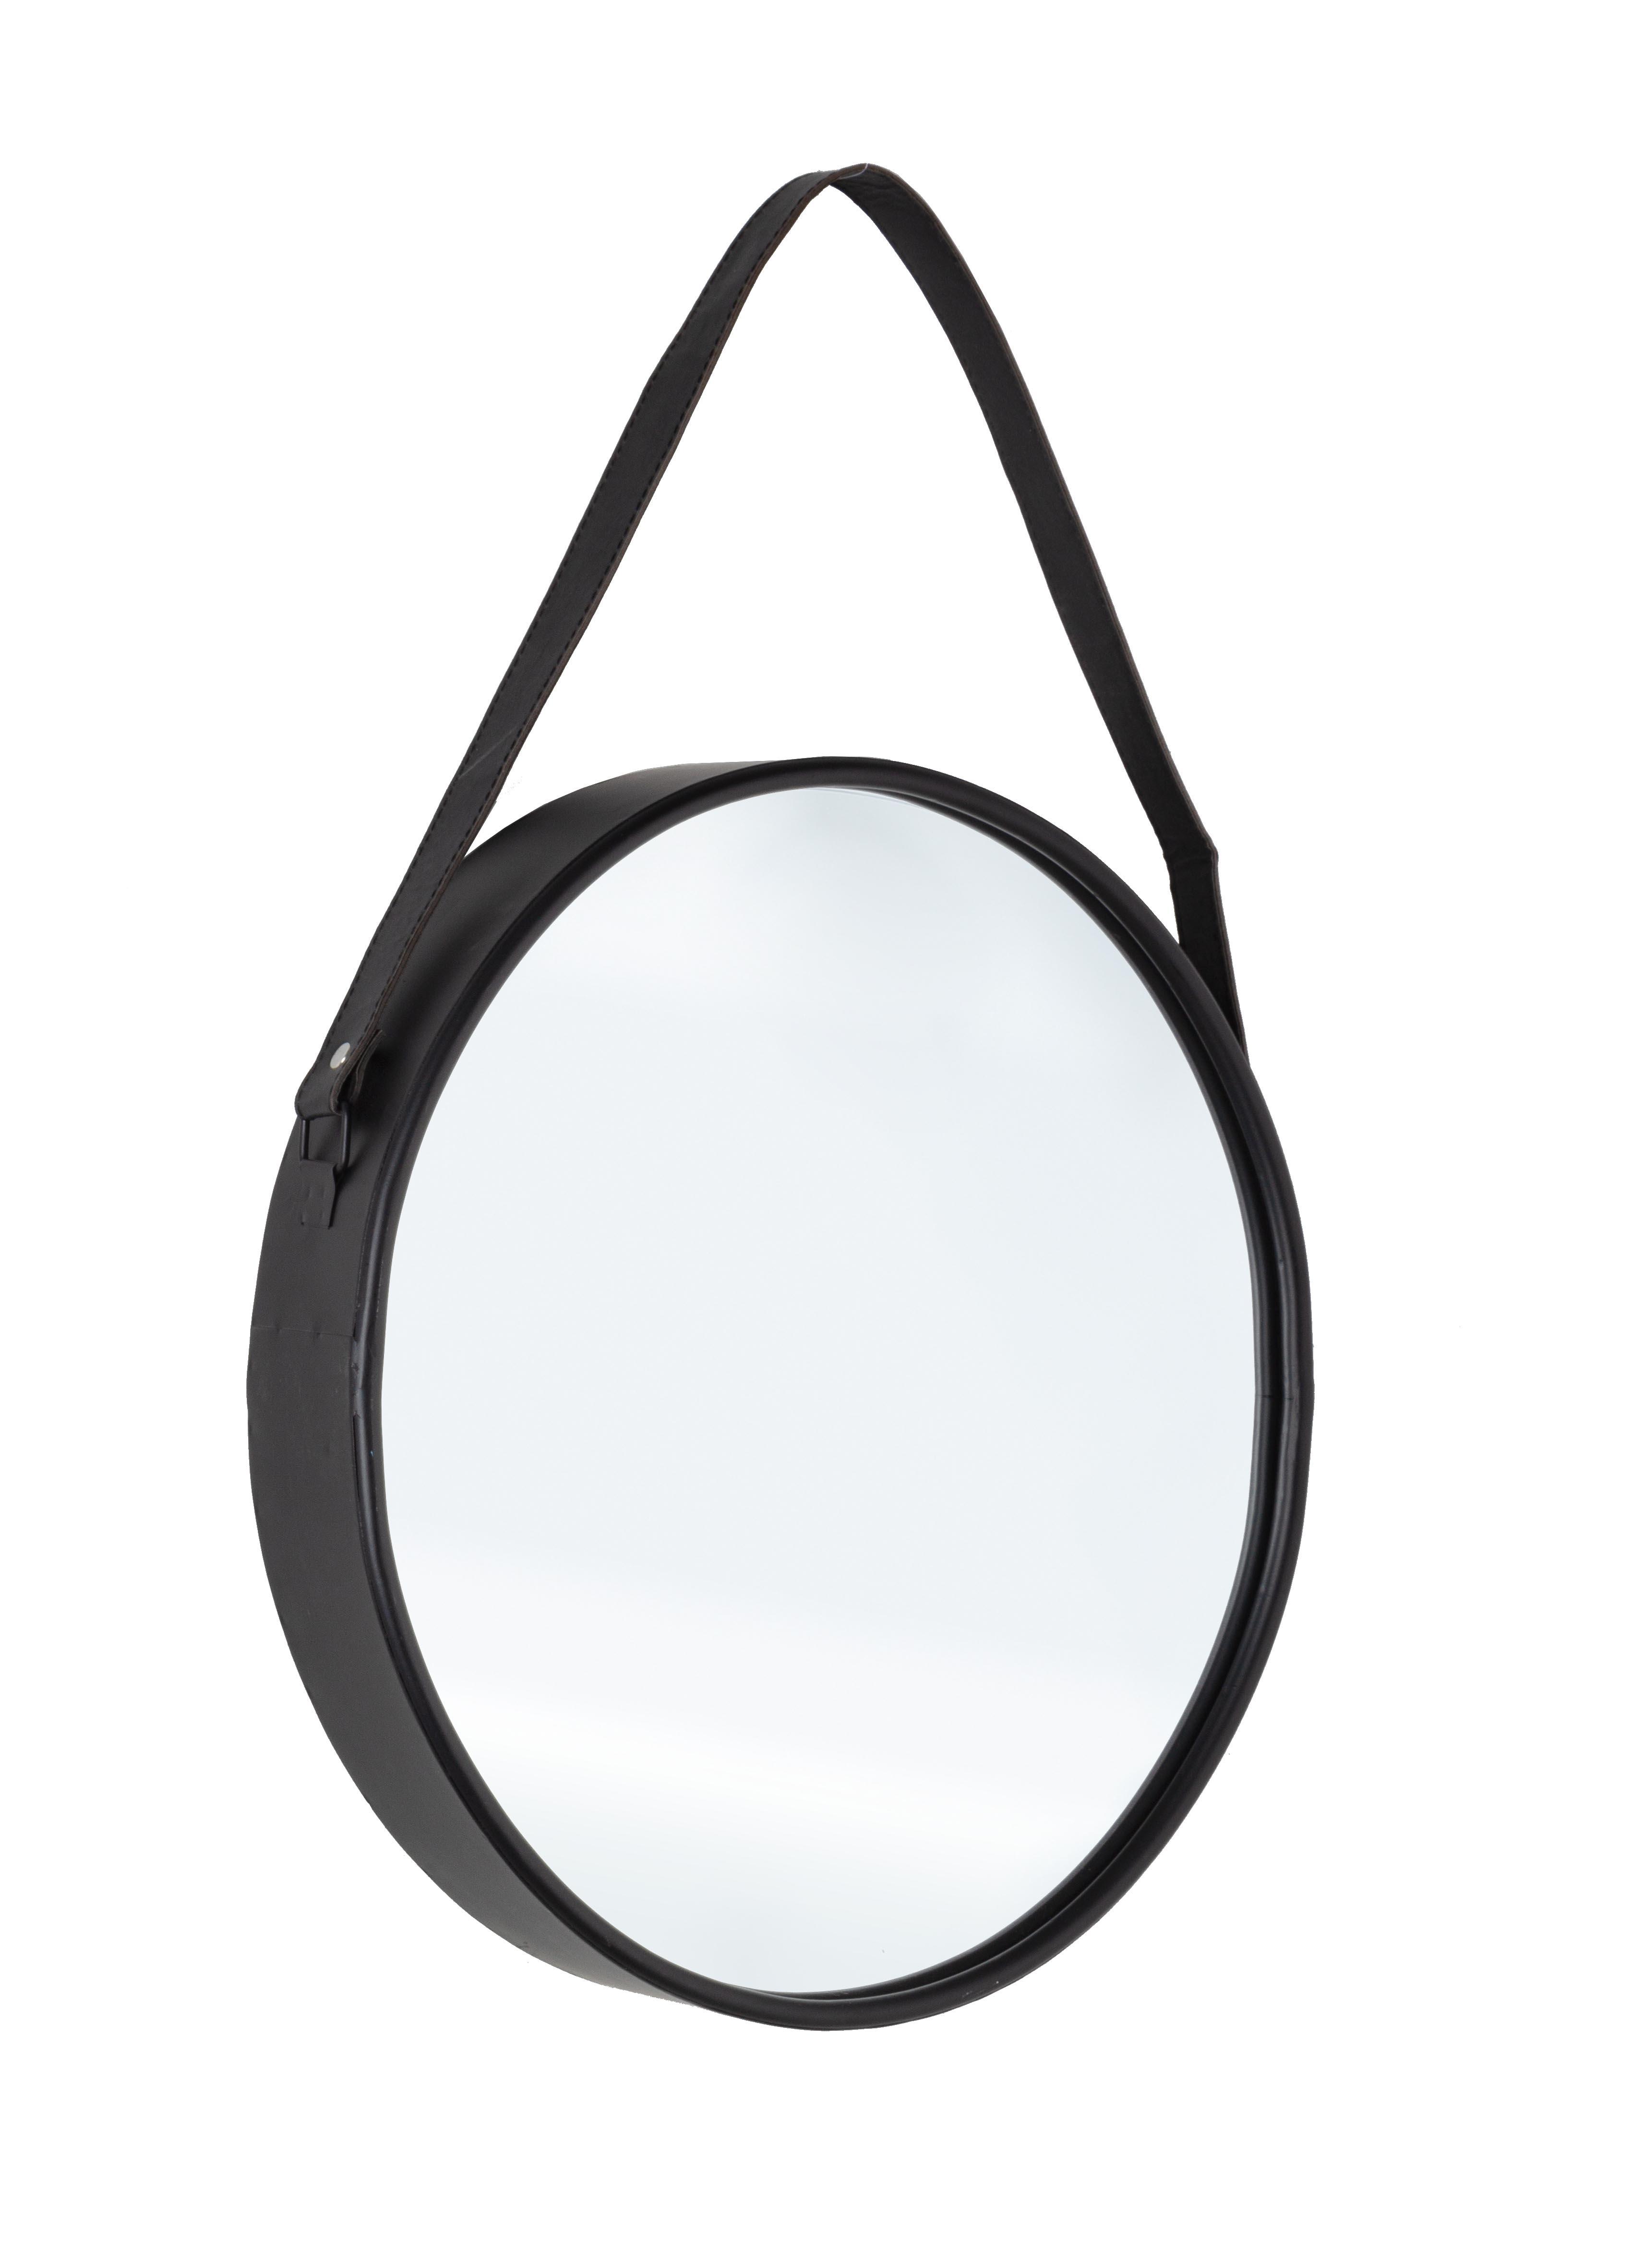 Oglinda decorativa cu rama metalica Rind Oval Negru, L41xl51 cm imagine